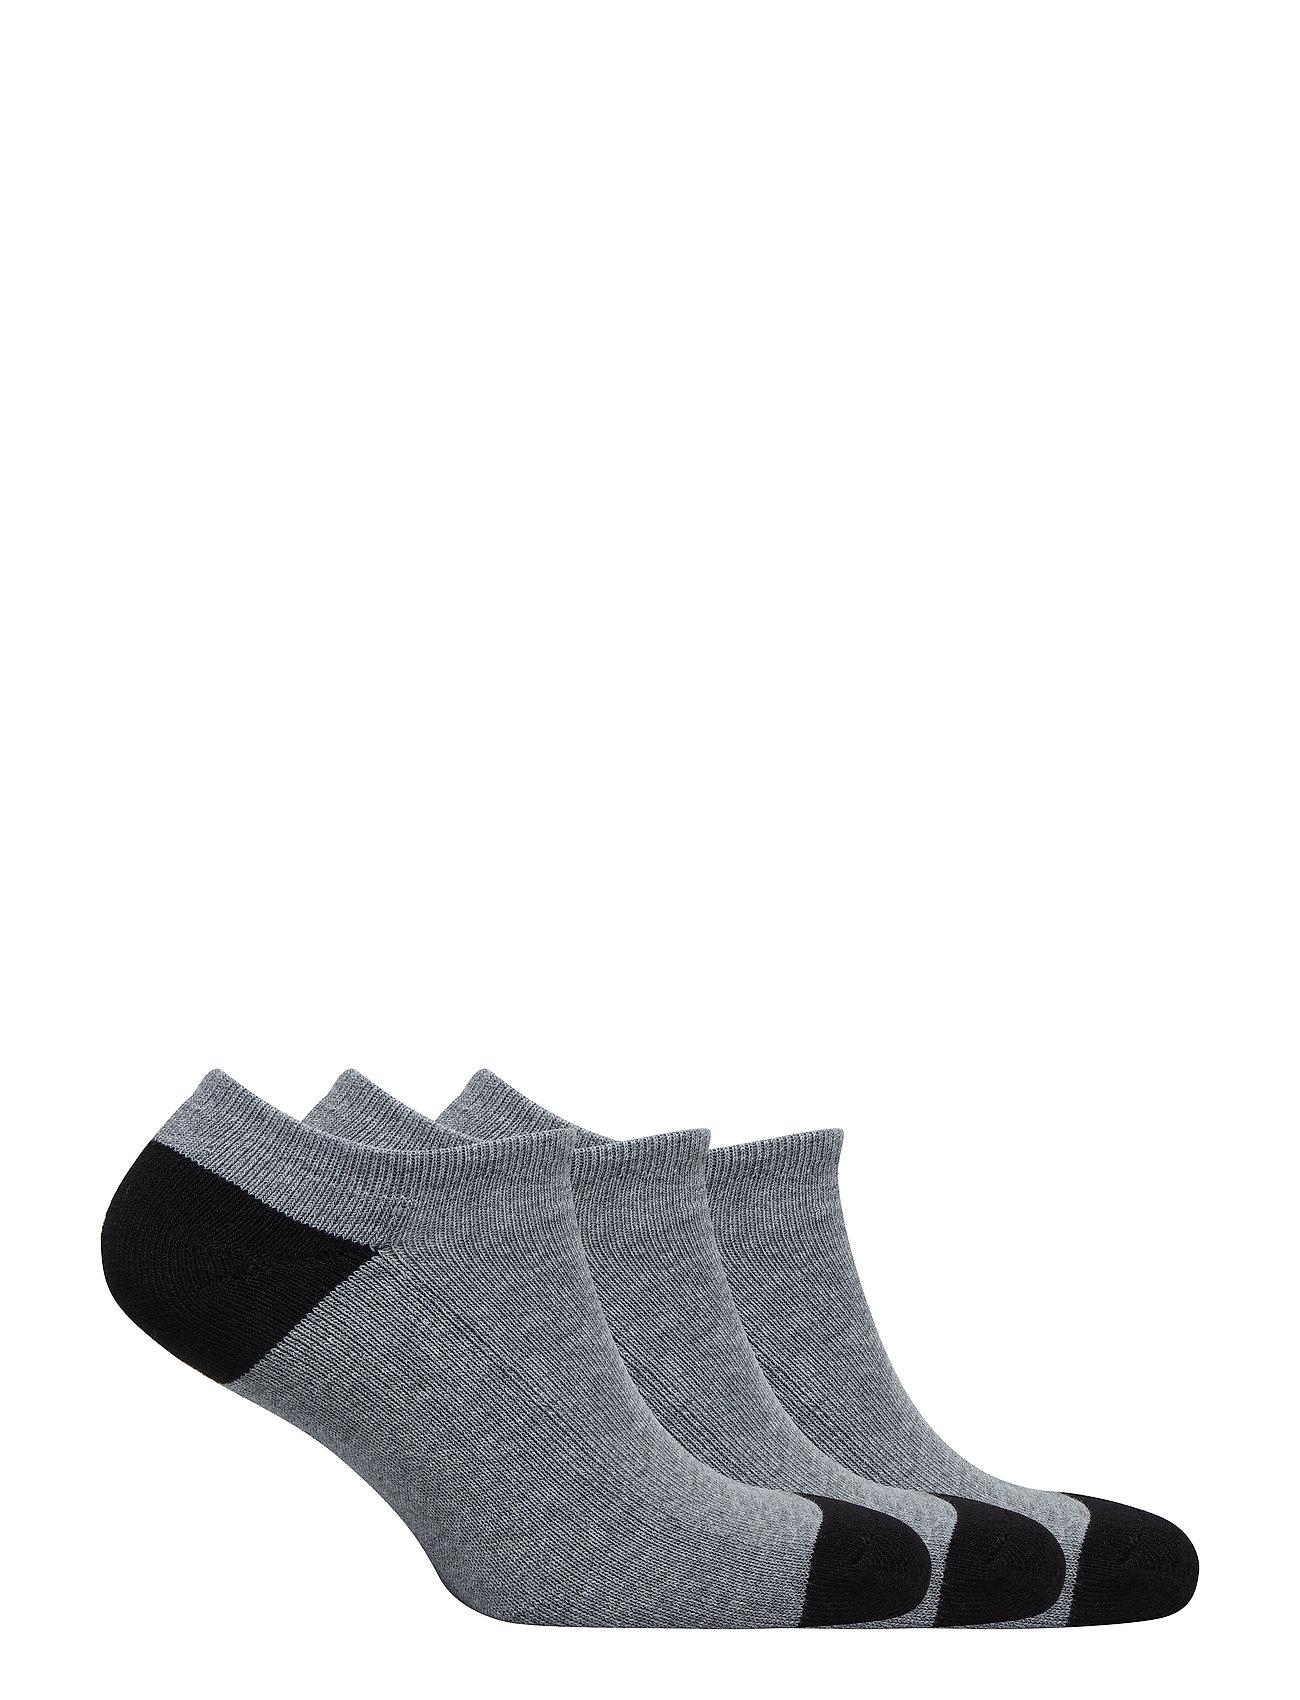 GAP Ankle Socks (3-pack) - GREY HEATHER